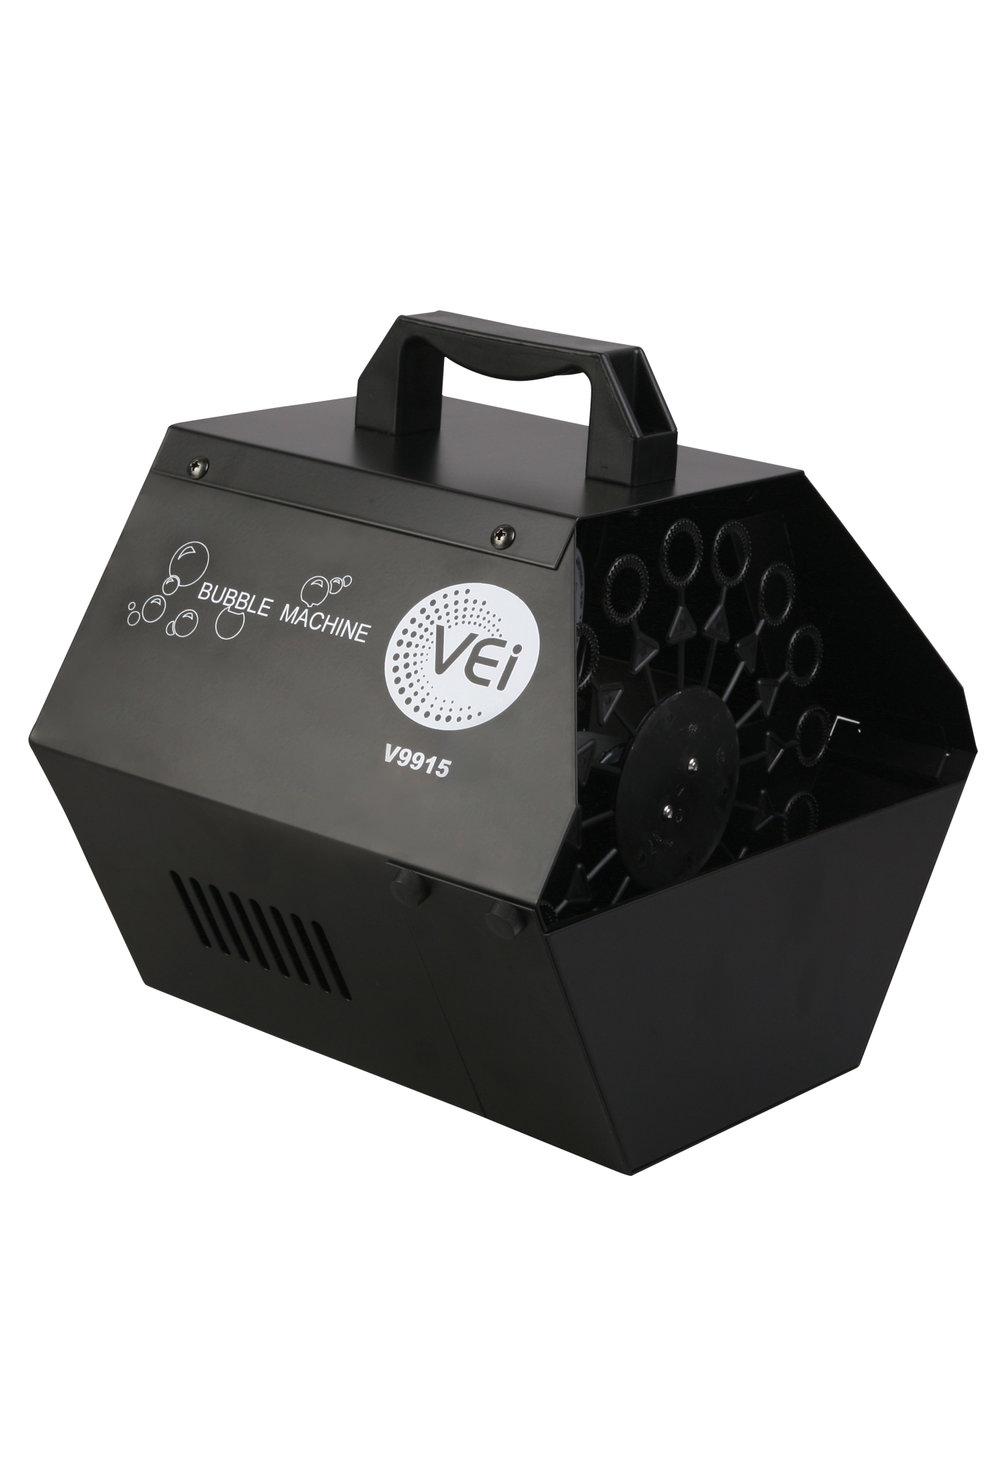 V9915